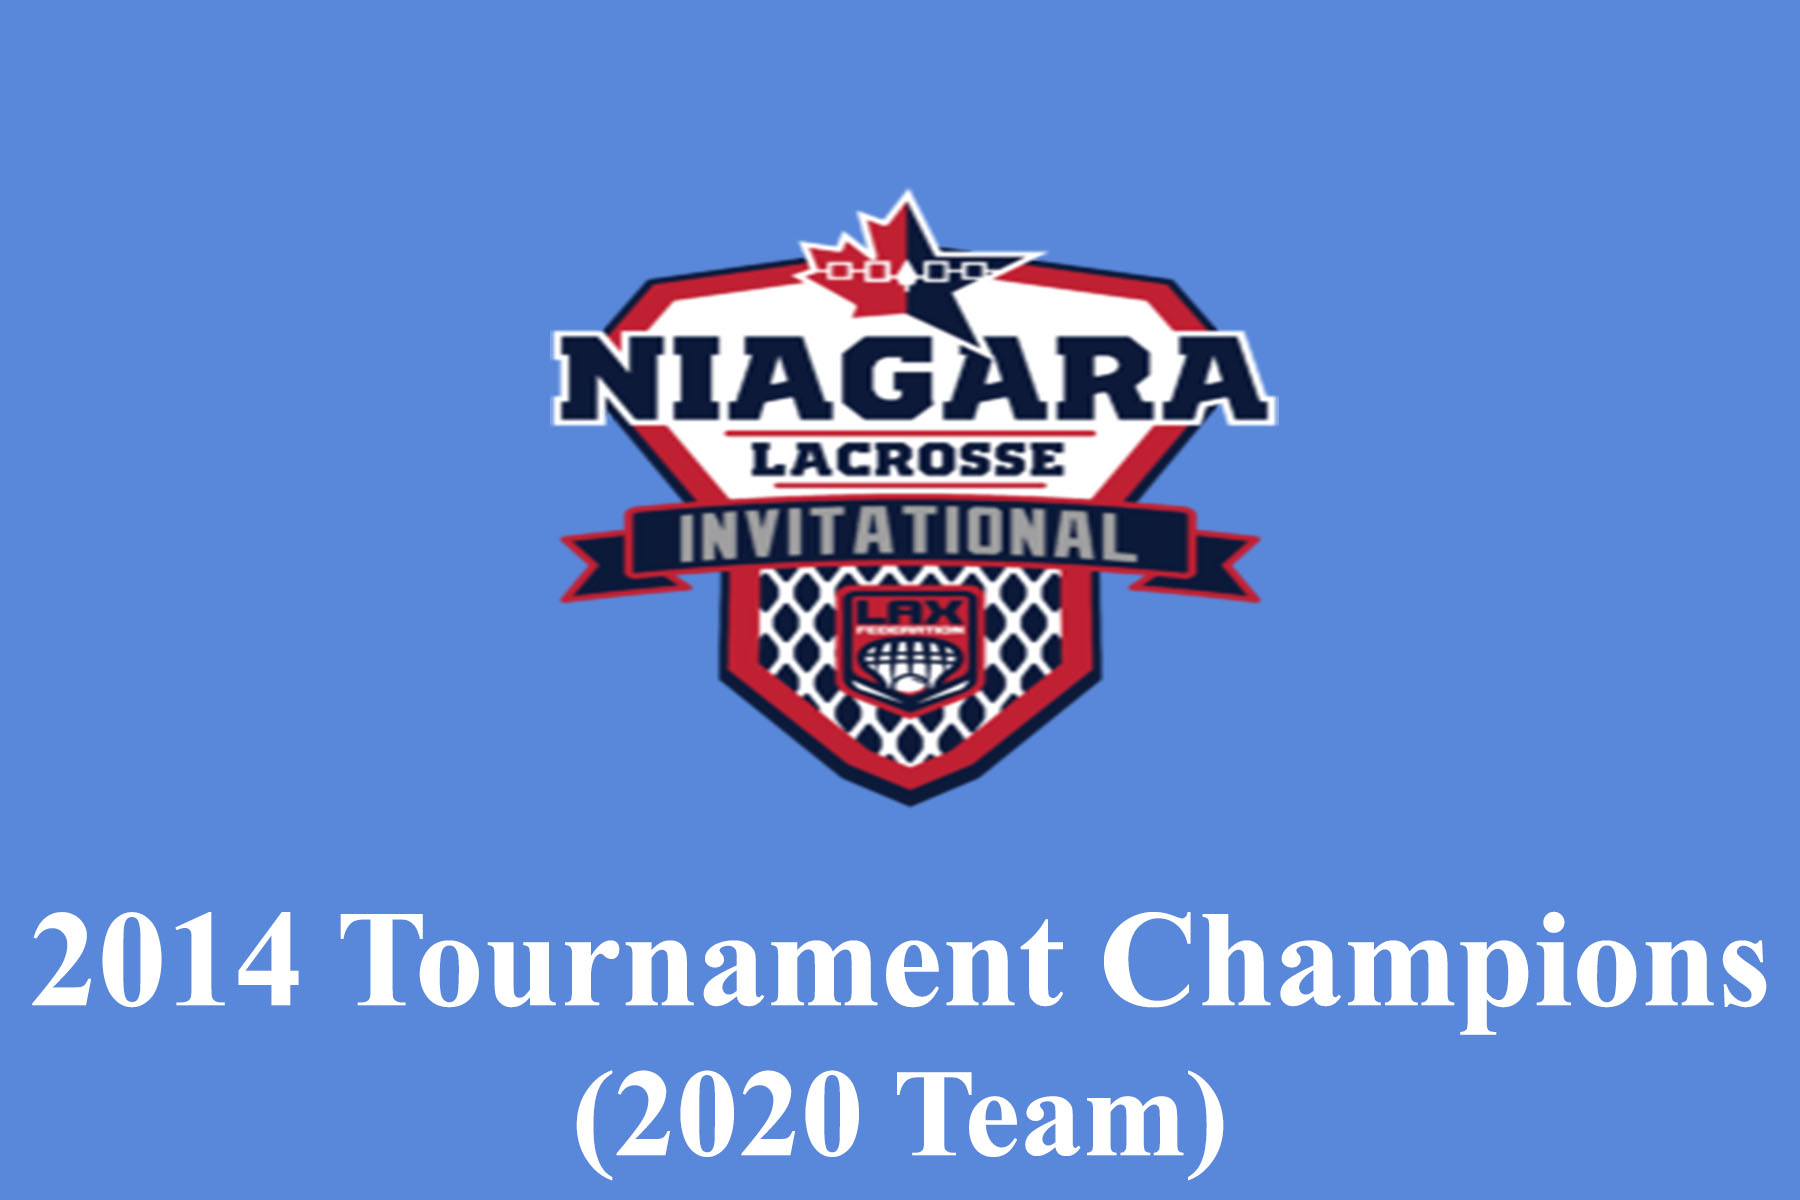 2014 NLC 2020 team